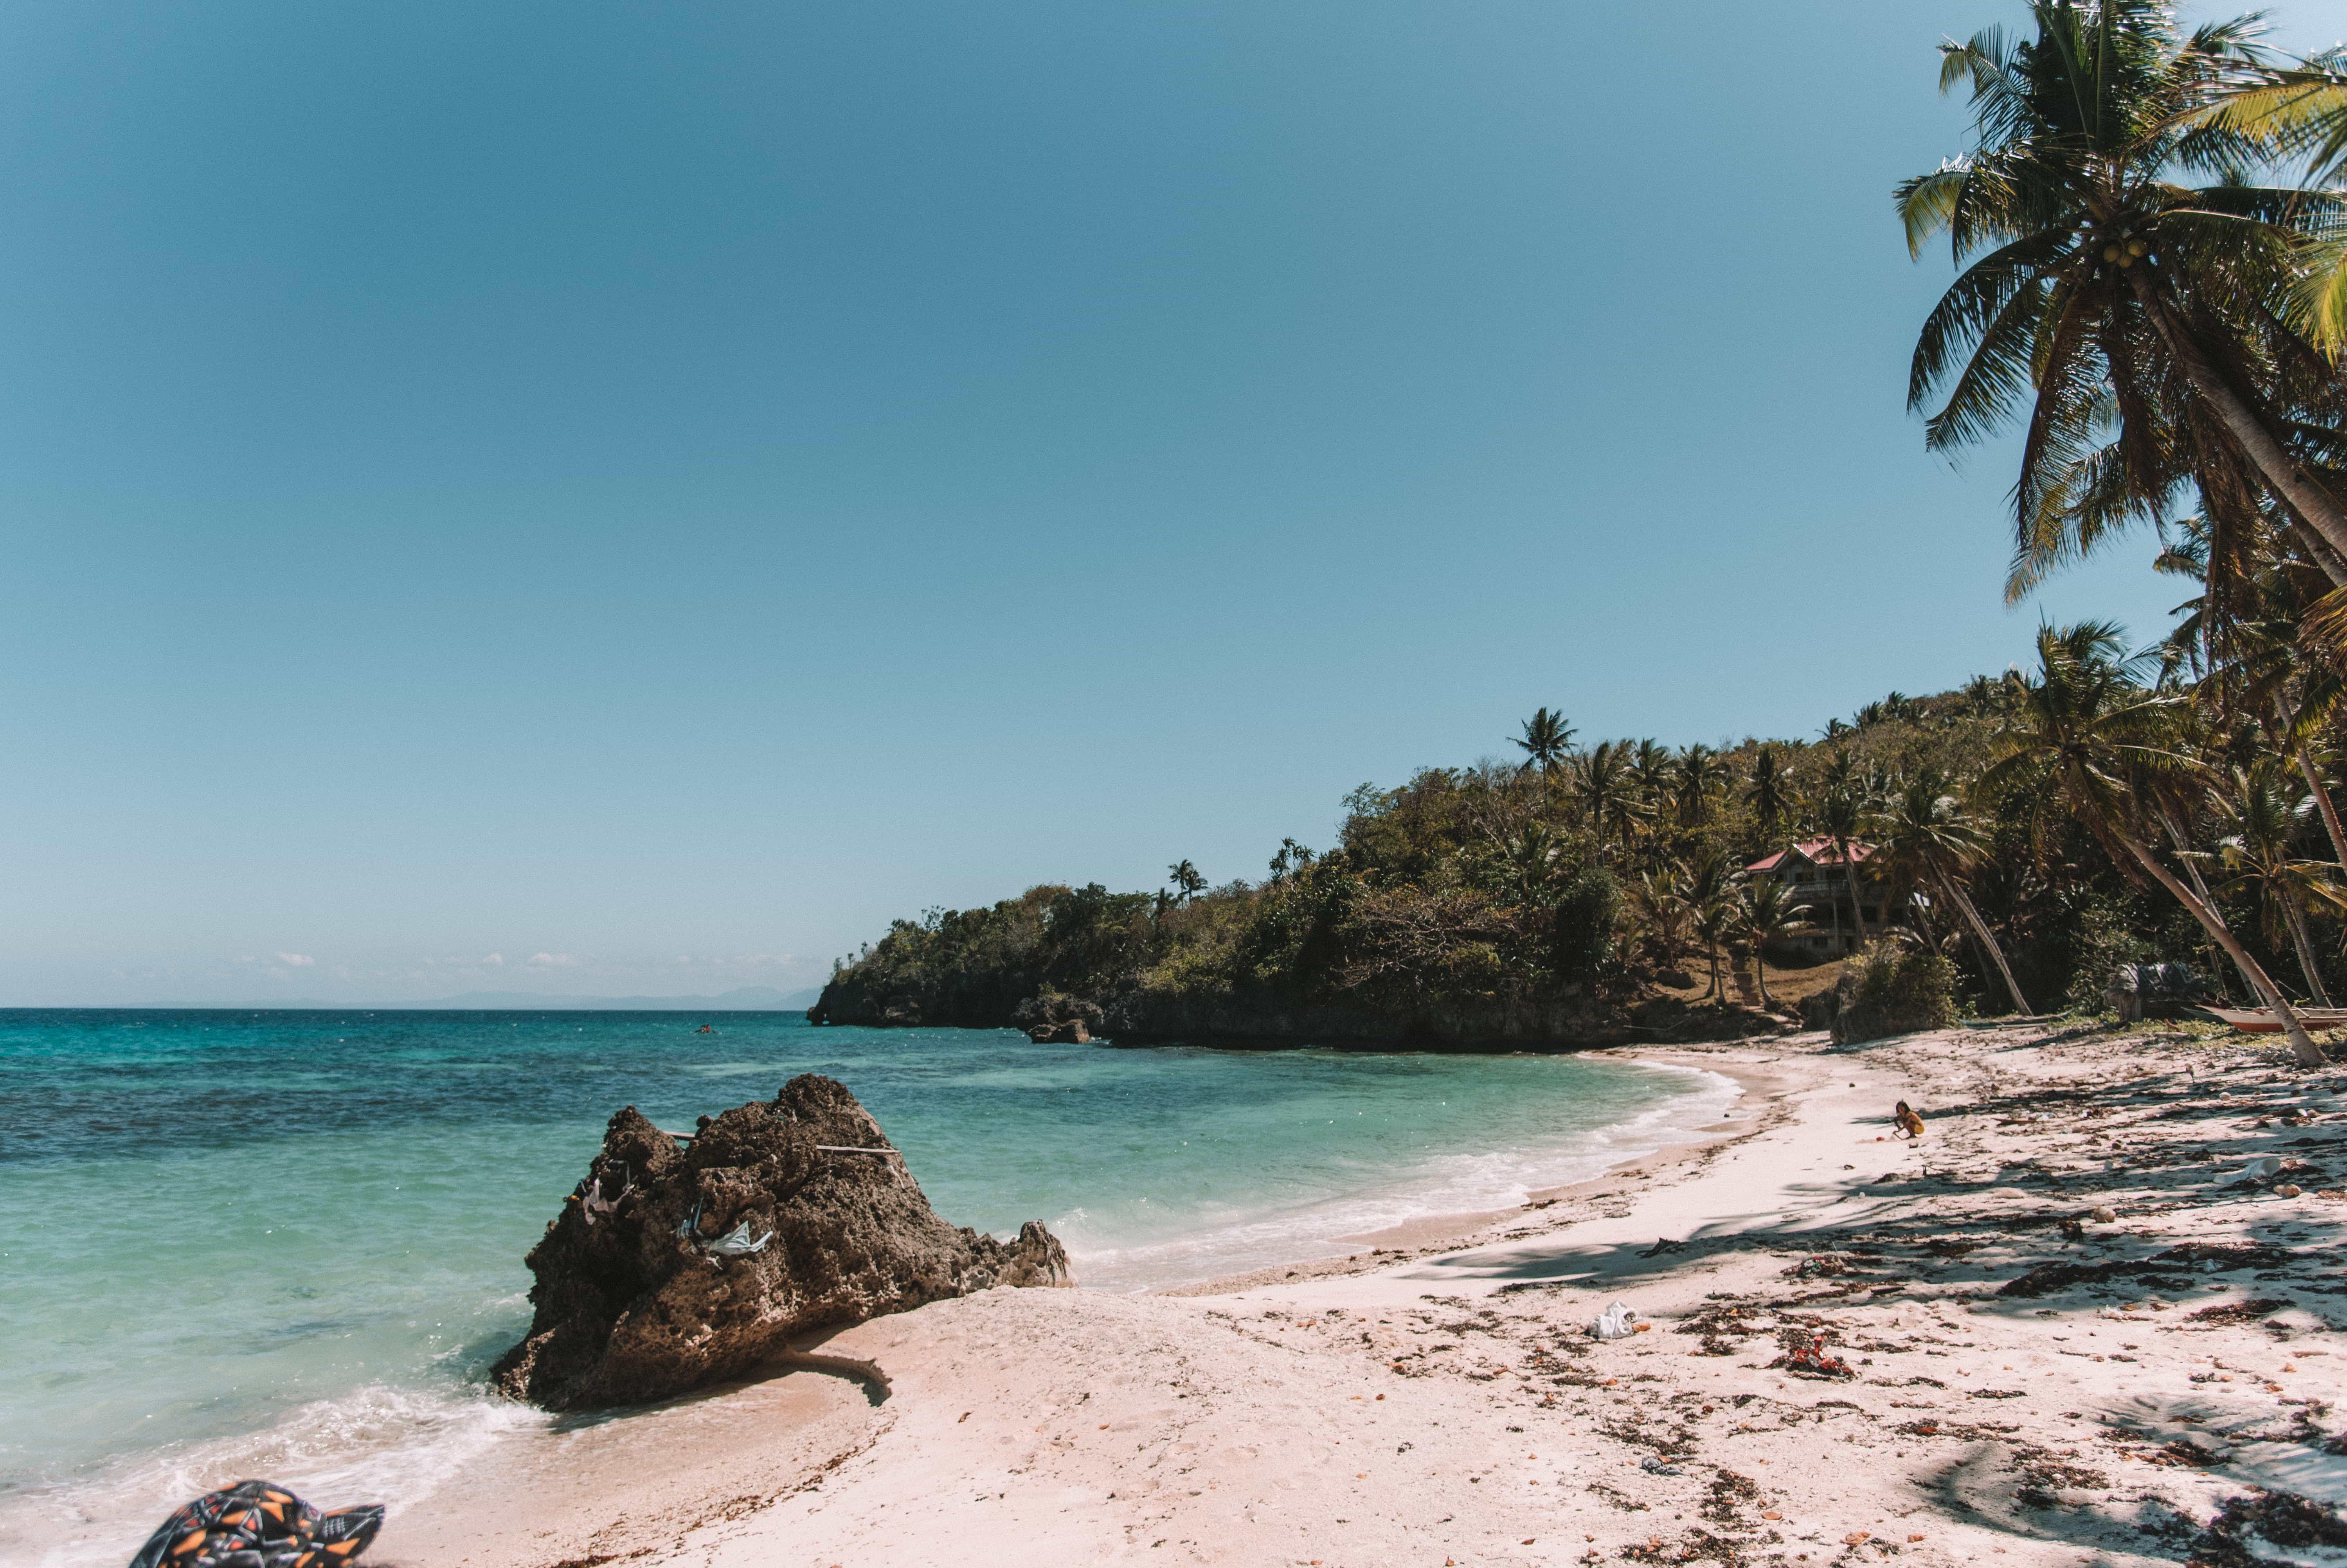 Carabao Island, How to get to Carabao Island, Carabao Island travel guide, what to do in Carabao Island, Said port